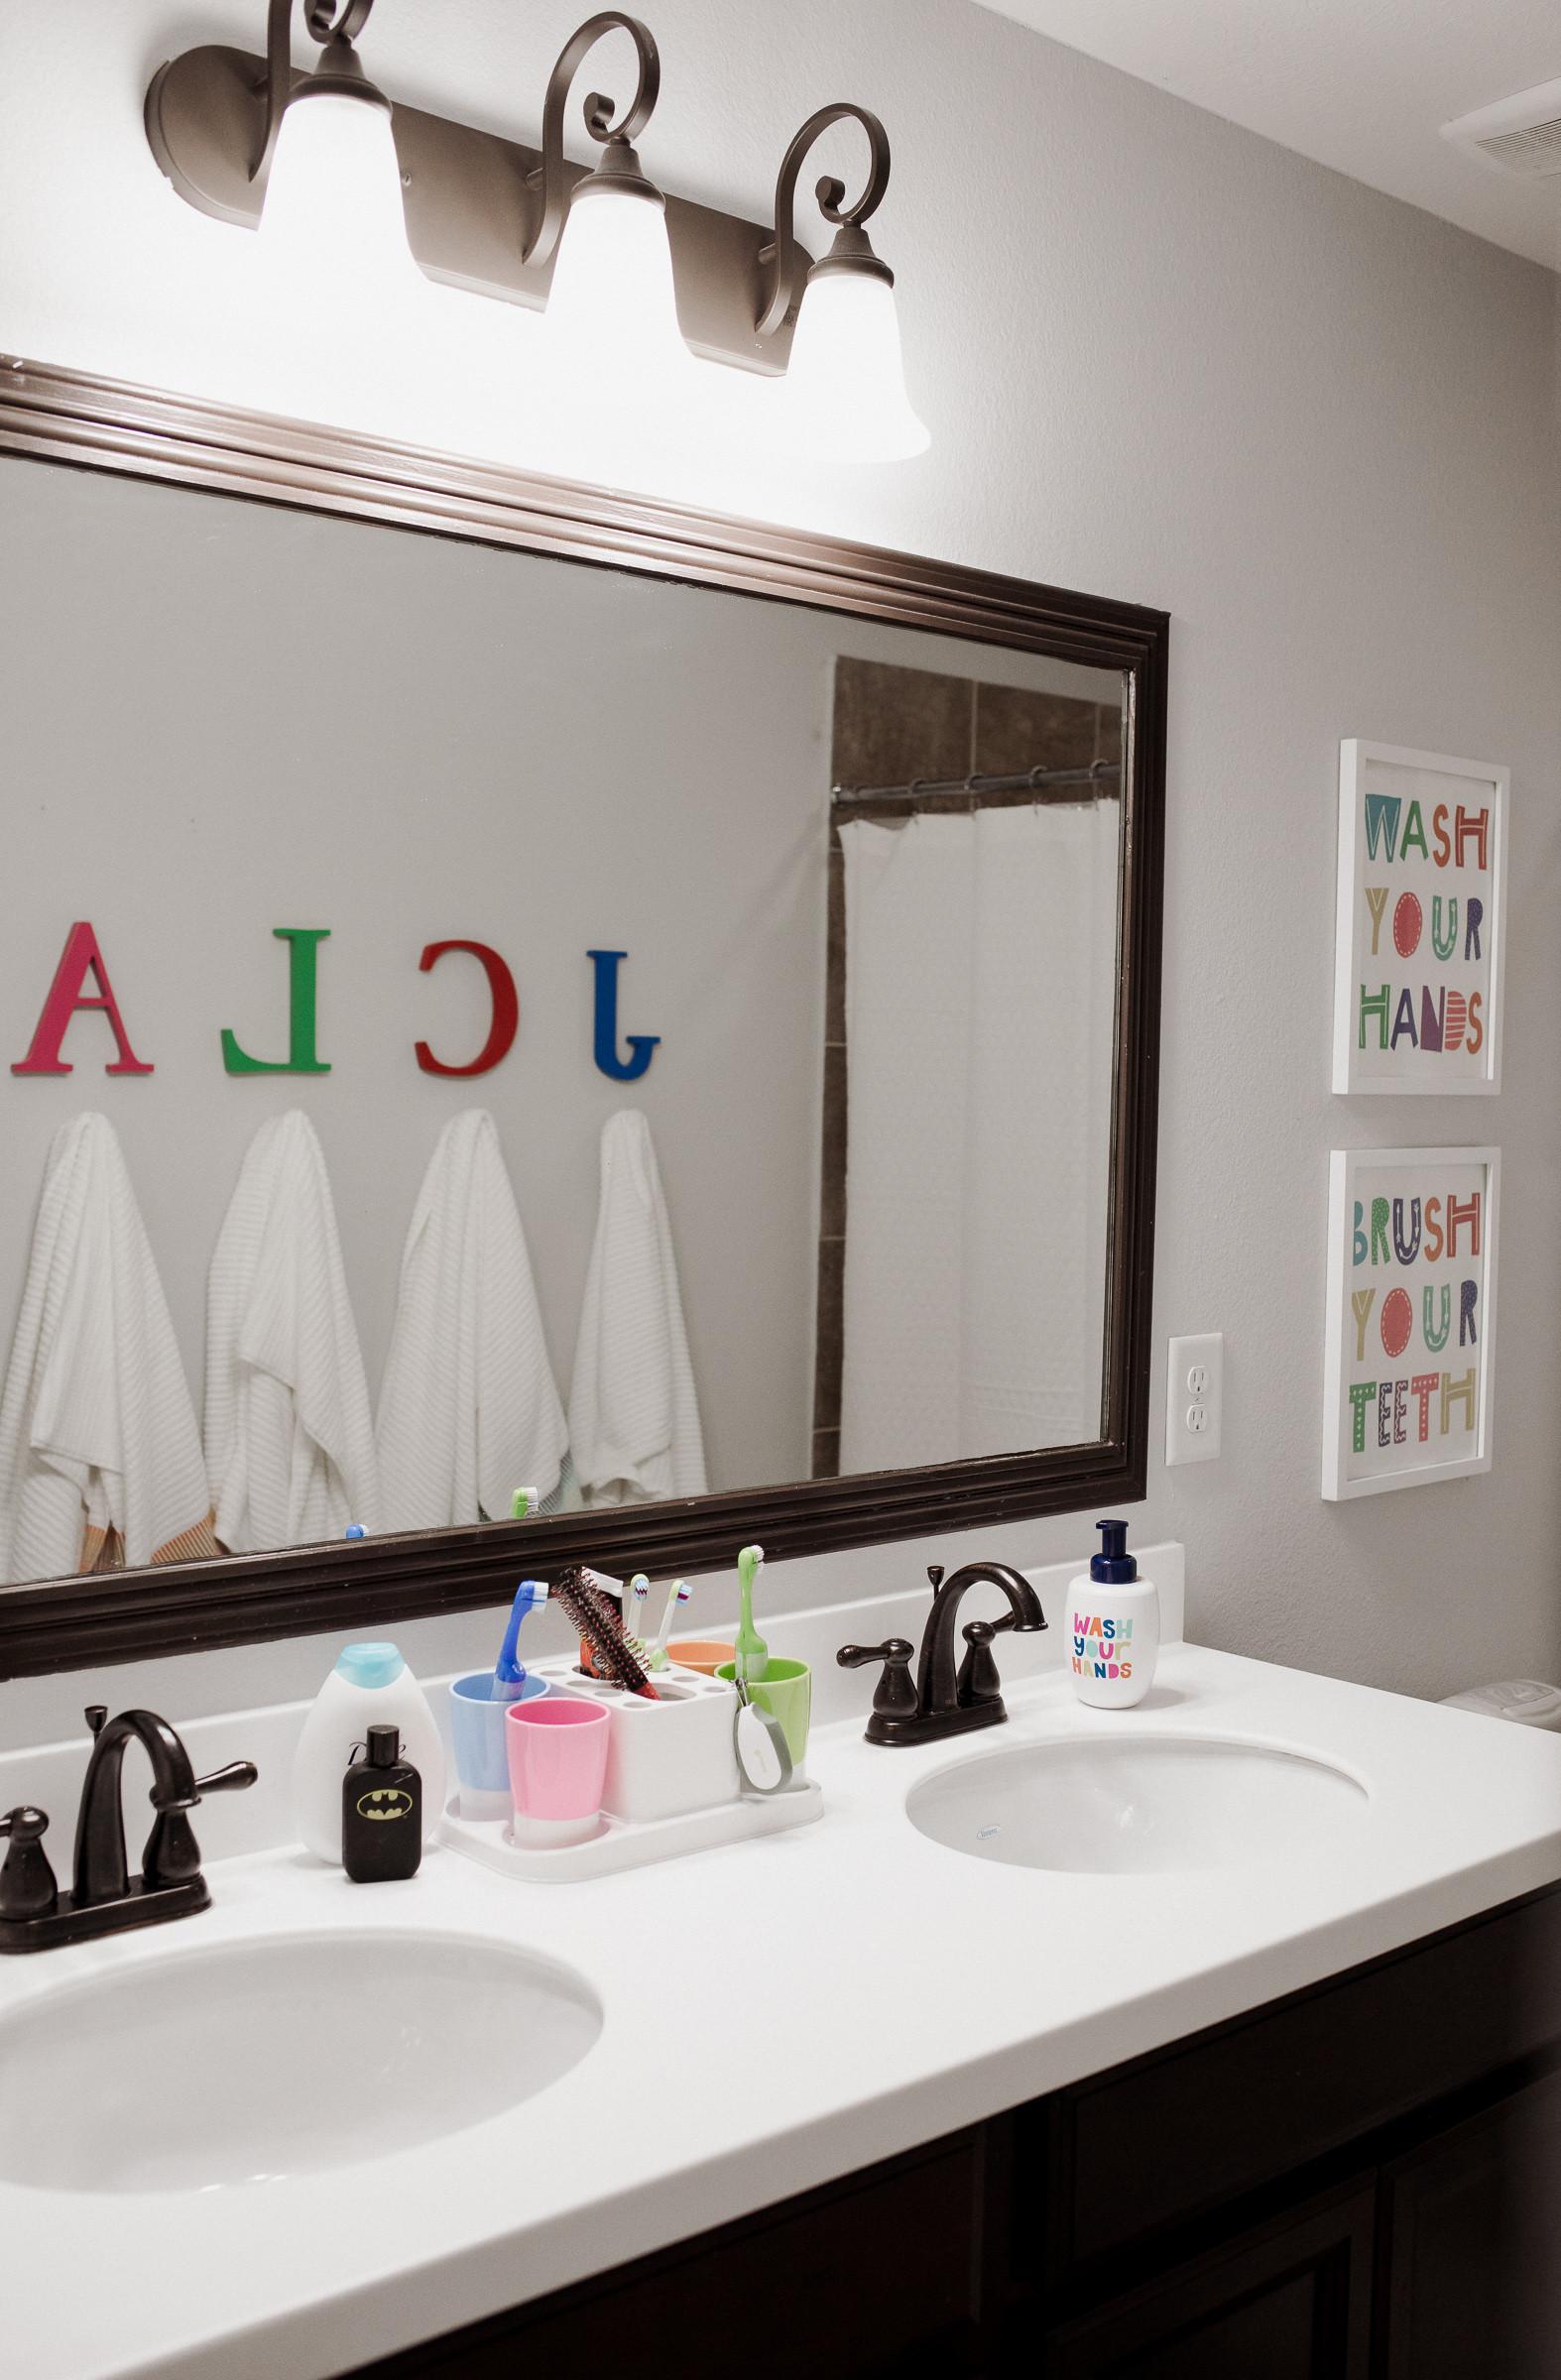 Kids Bathroom Sets  Our Kids d Bathroom Decor Makeover Uptown with Elly